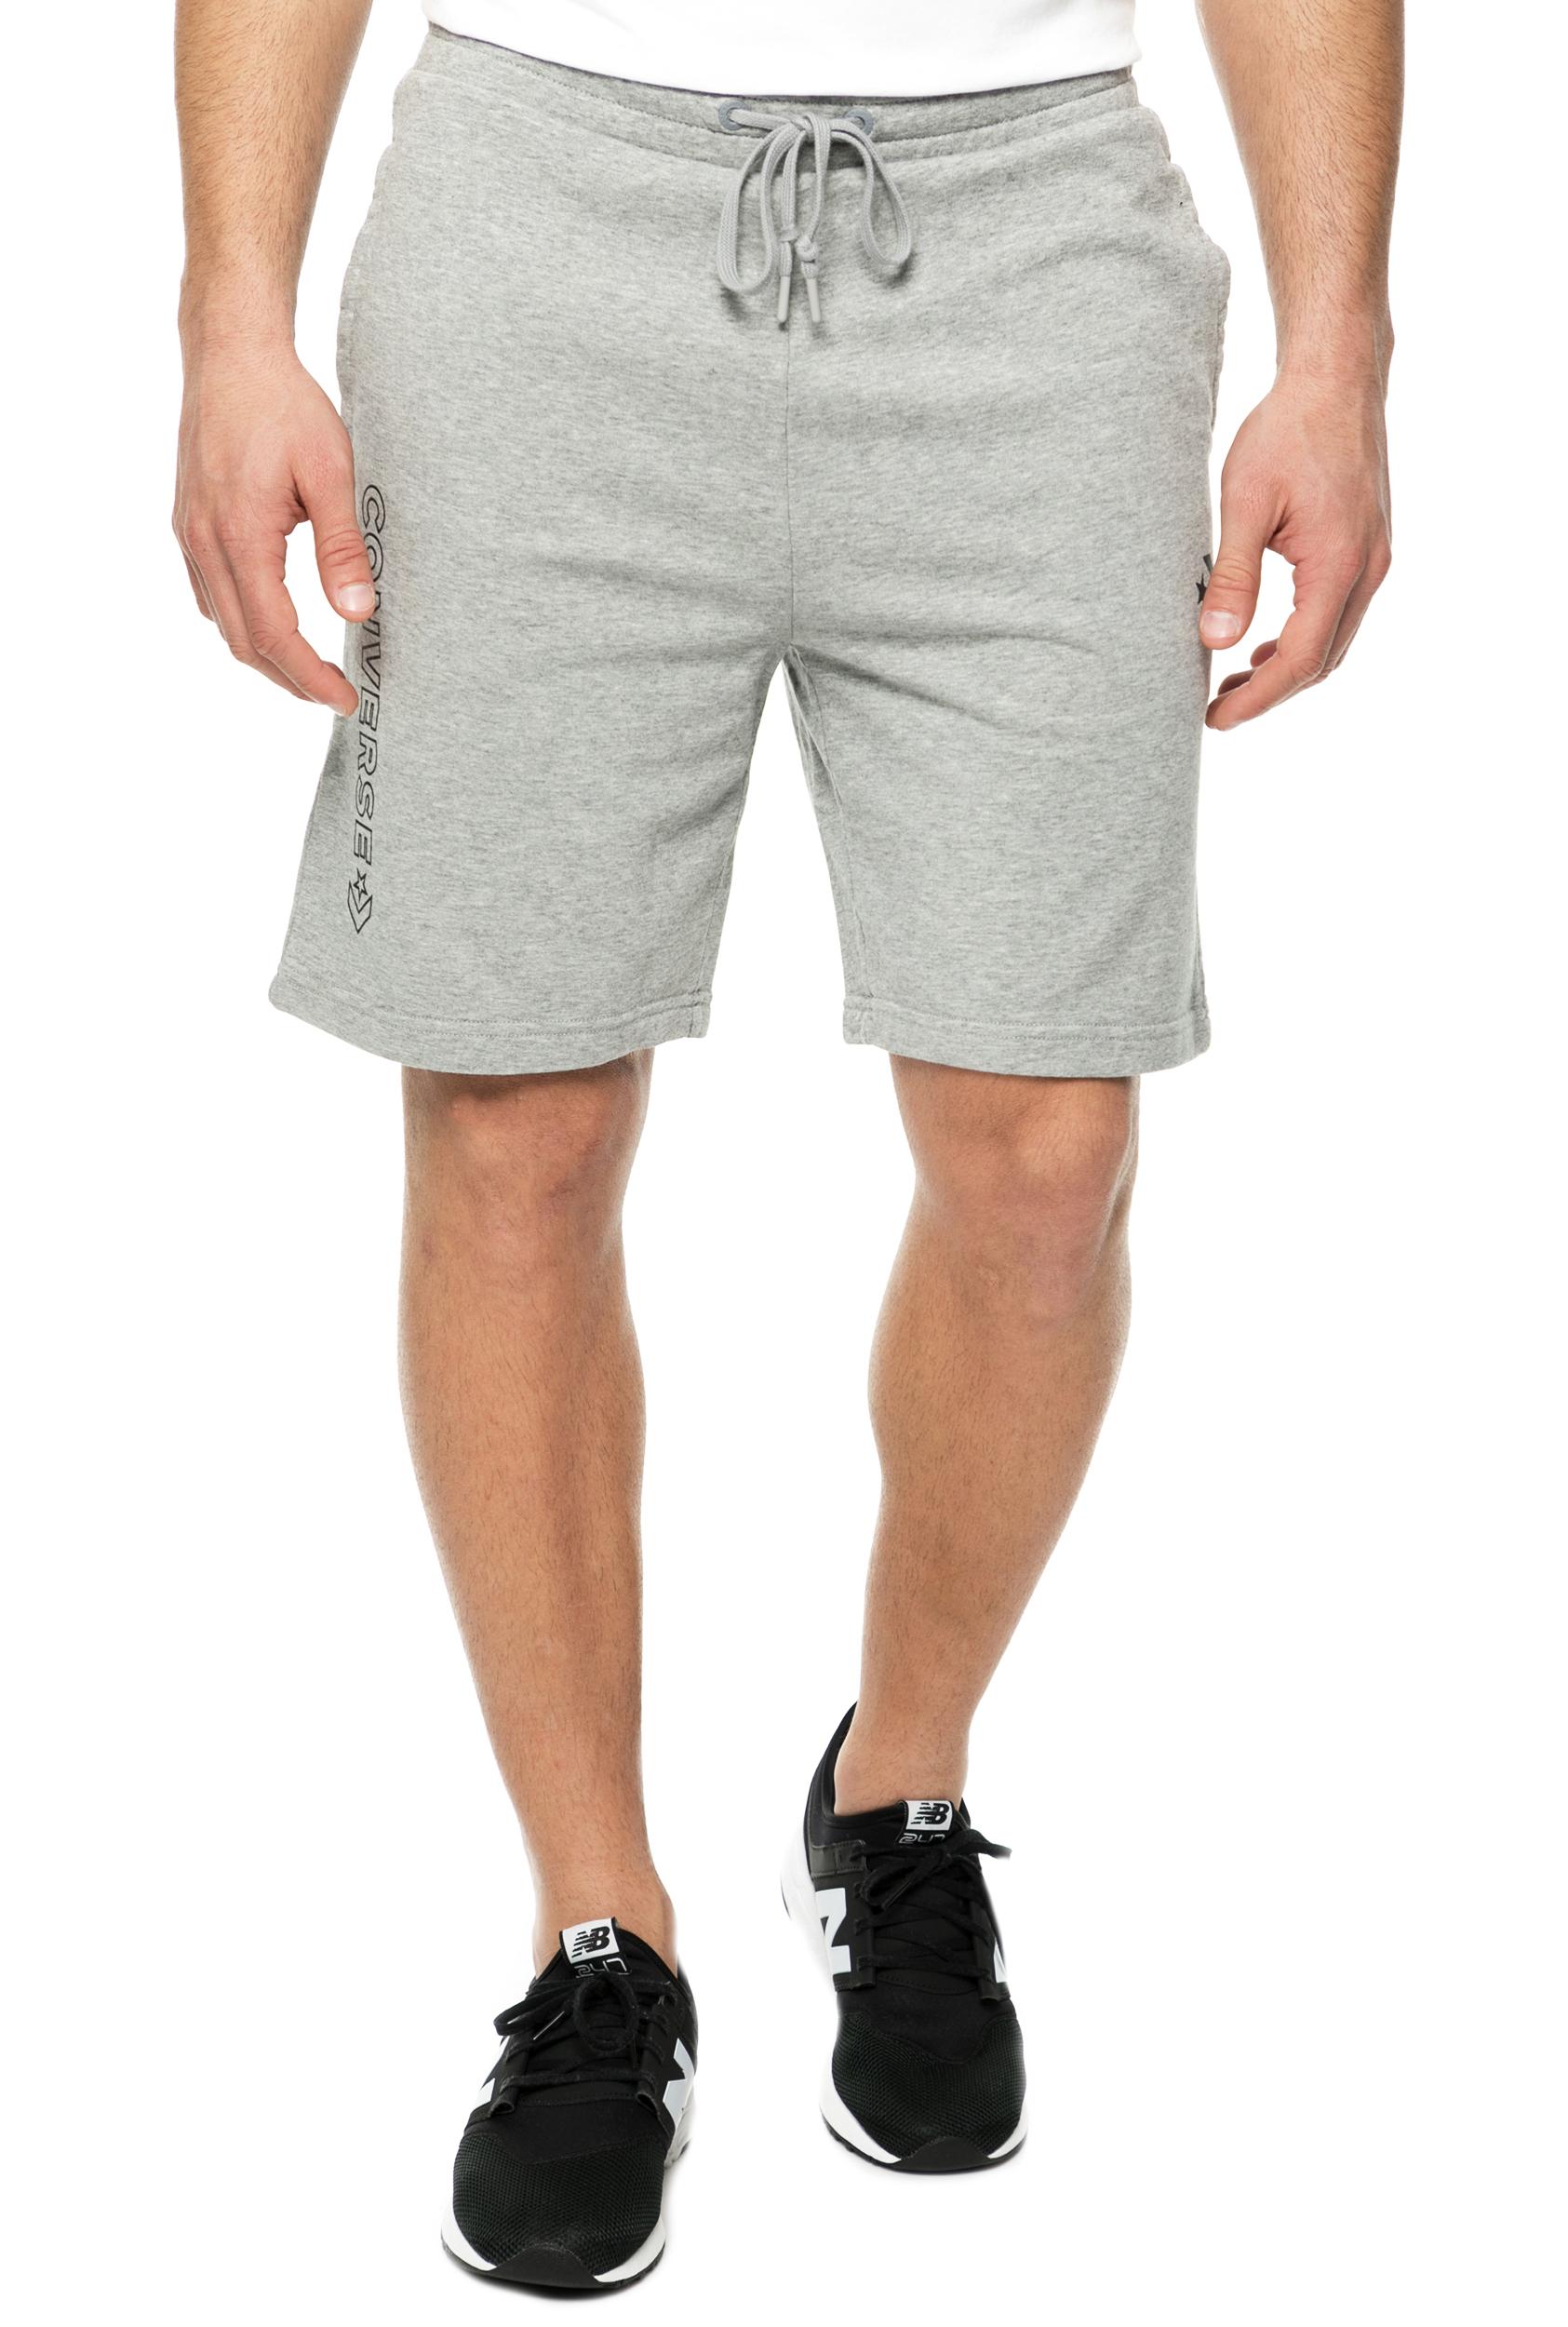 CONVERSE - Ανδρική βερμούδα CONVERSE ESSENTIALS γκρι ανδρικά ρούχα σορτς βερμούδες casual jean